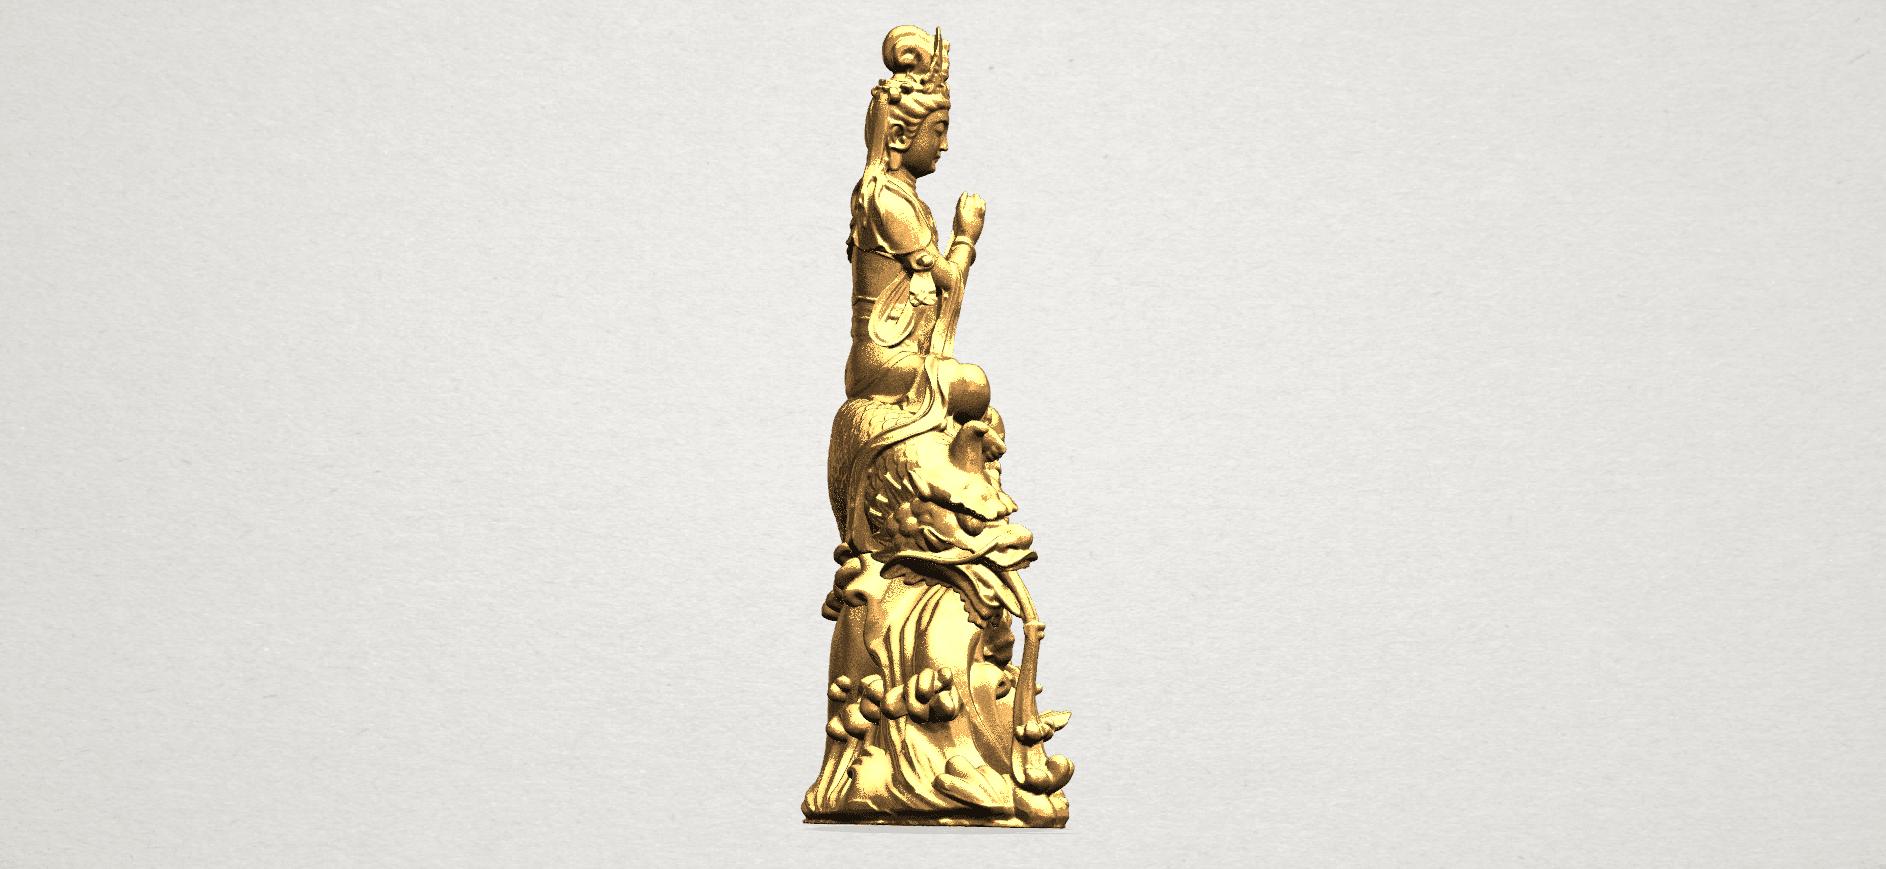 Avalokitesvara Bodhisattva (with fish) 88mm - A06.png Télécharger fichier 3DS gratuit Avalokitesvara Bodhisattva (avec poisson) 01 • Modèle imprimable en 3D, GeorgesNikkei